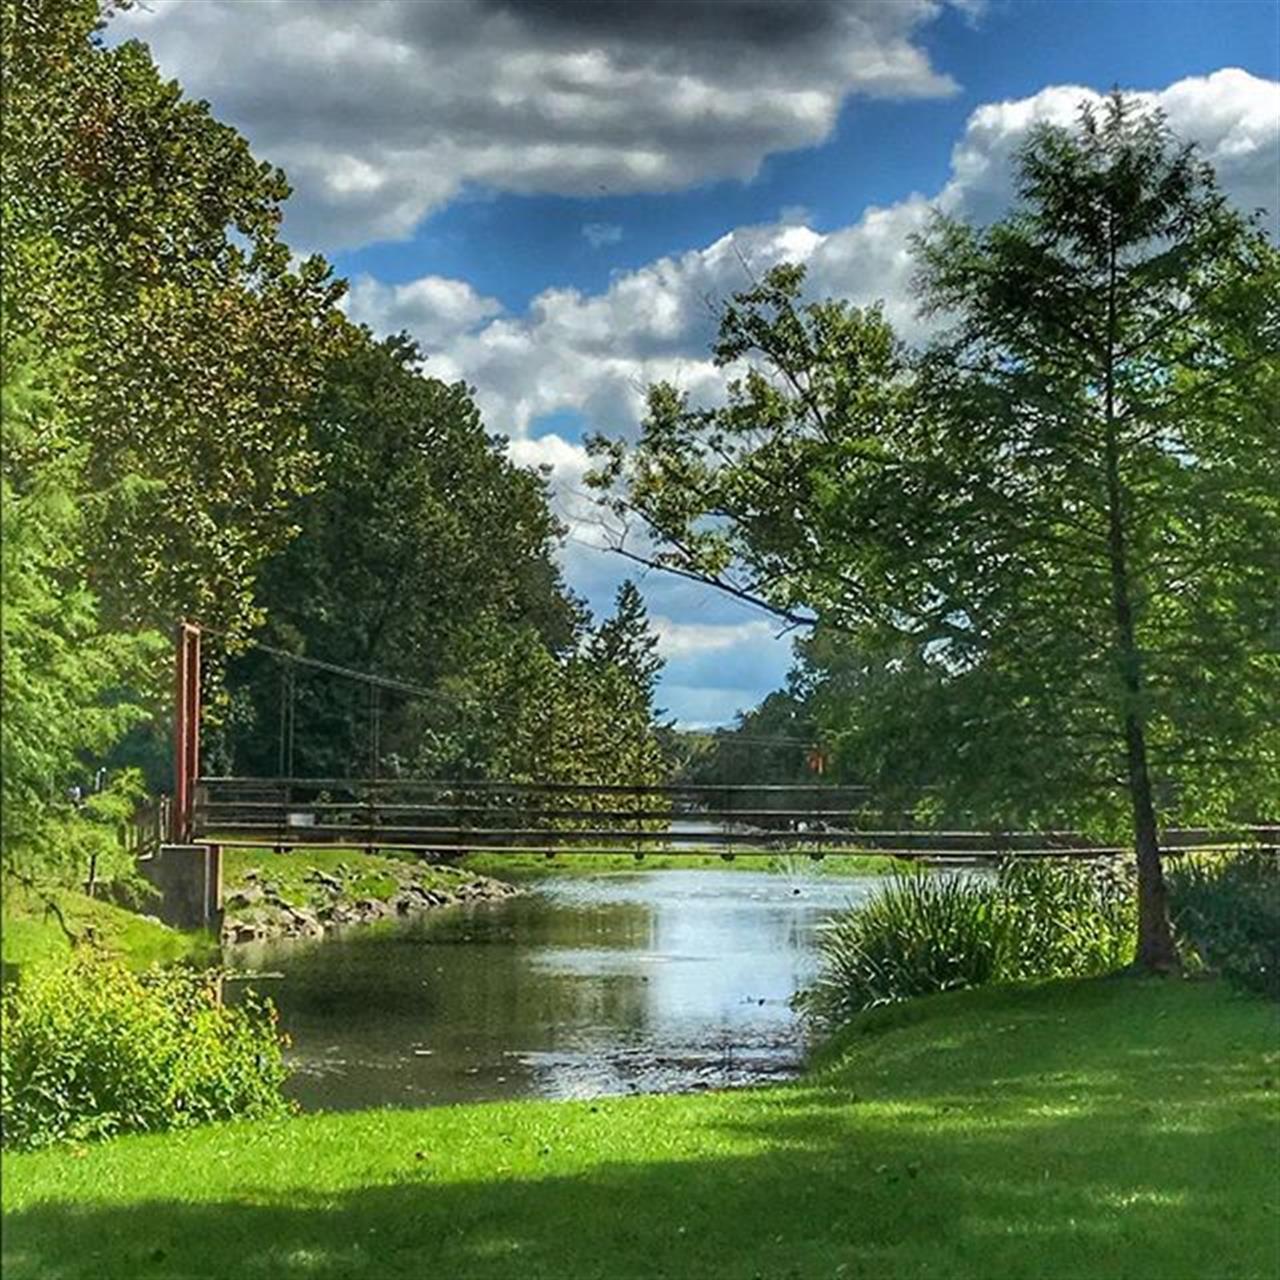 What is your favorite spot in #bridgewater #va? #wildwoodpark #leadingrelocal